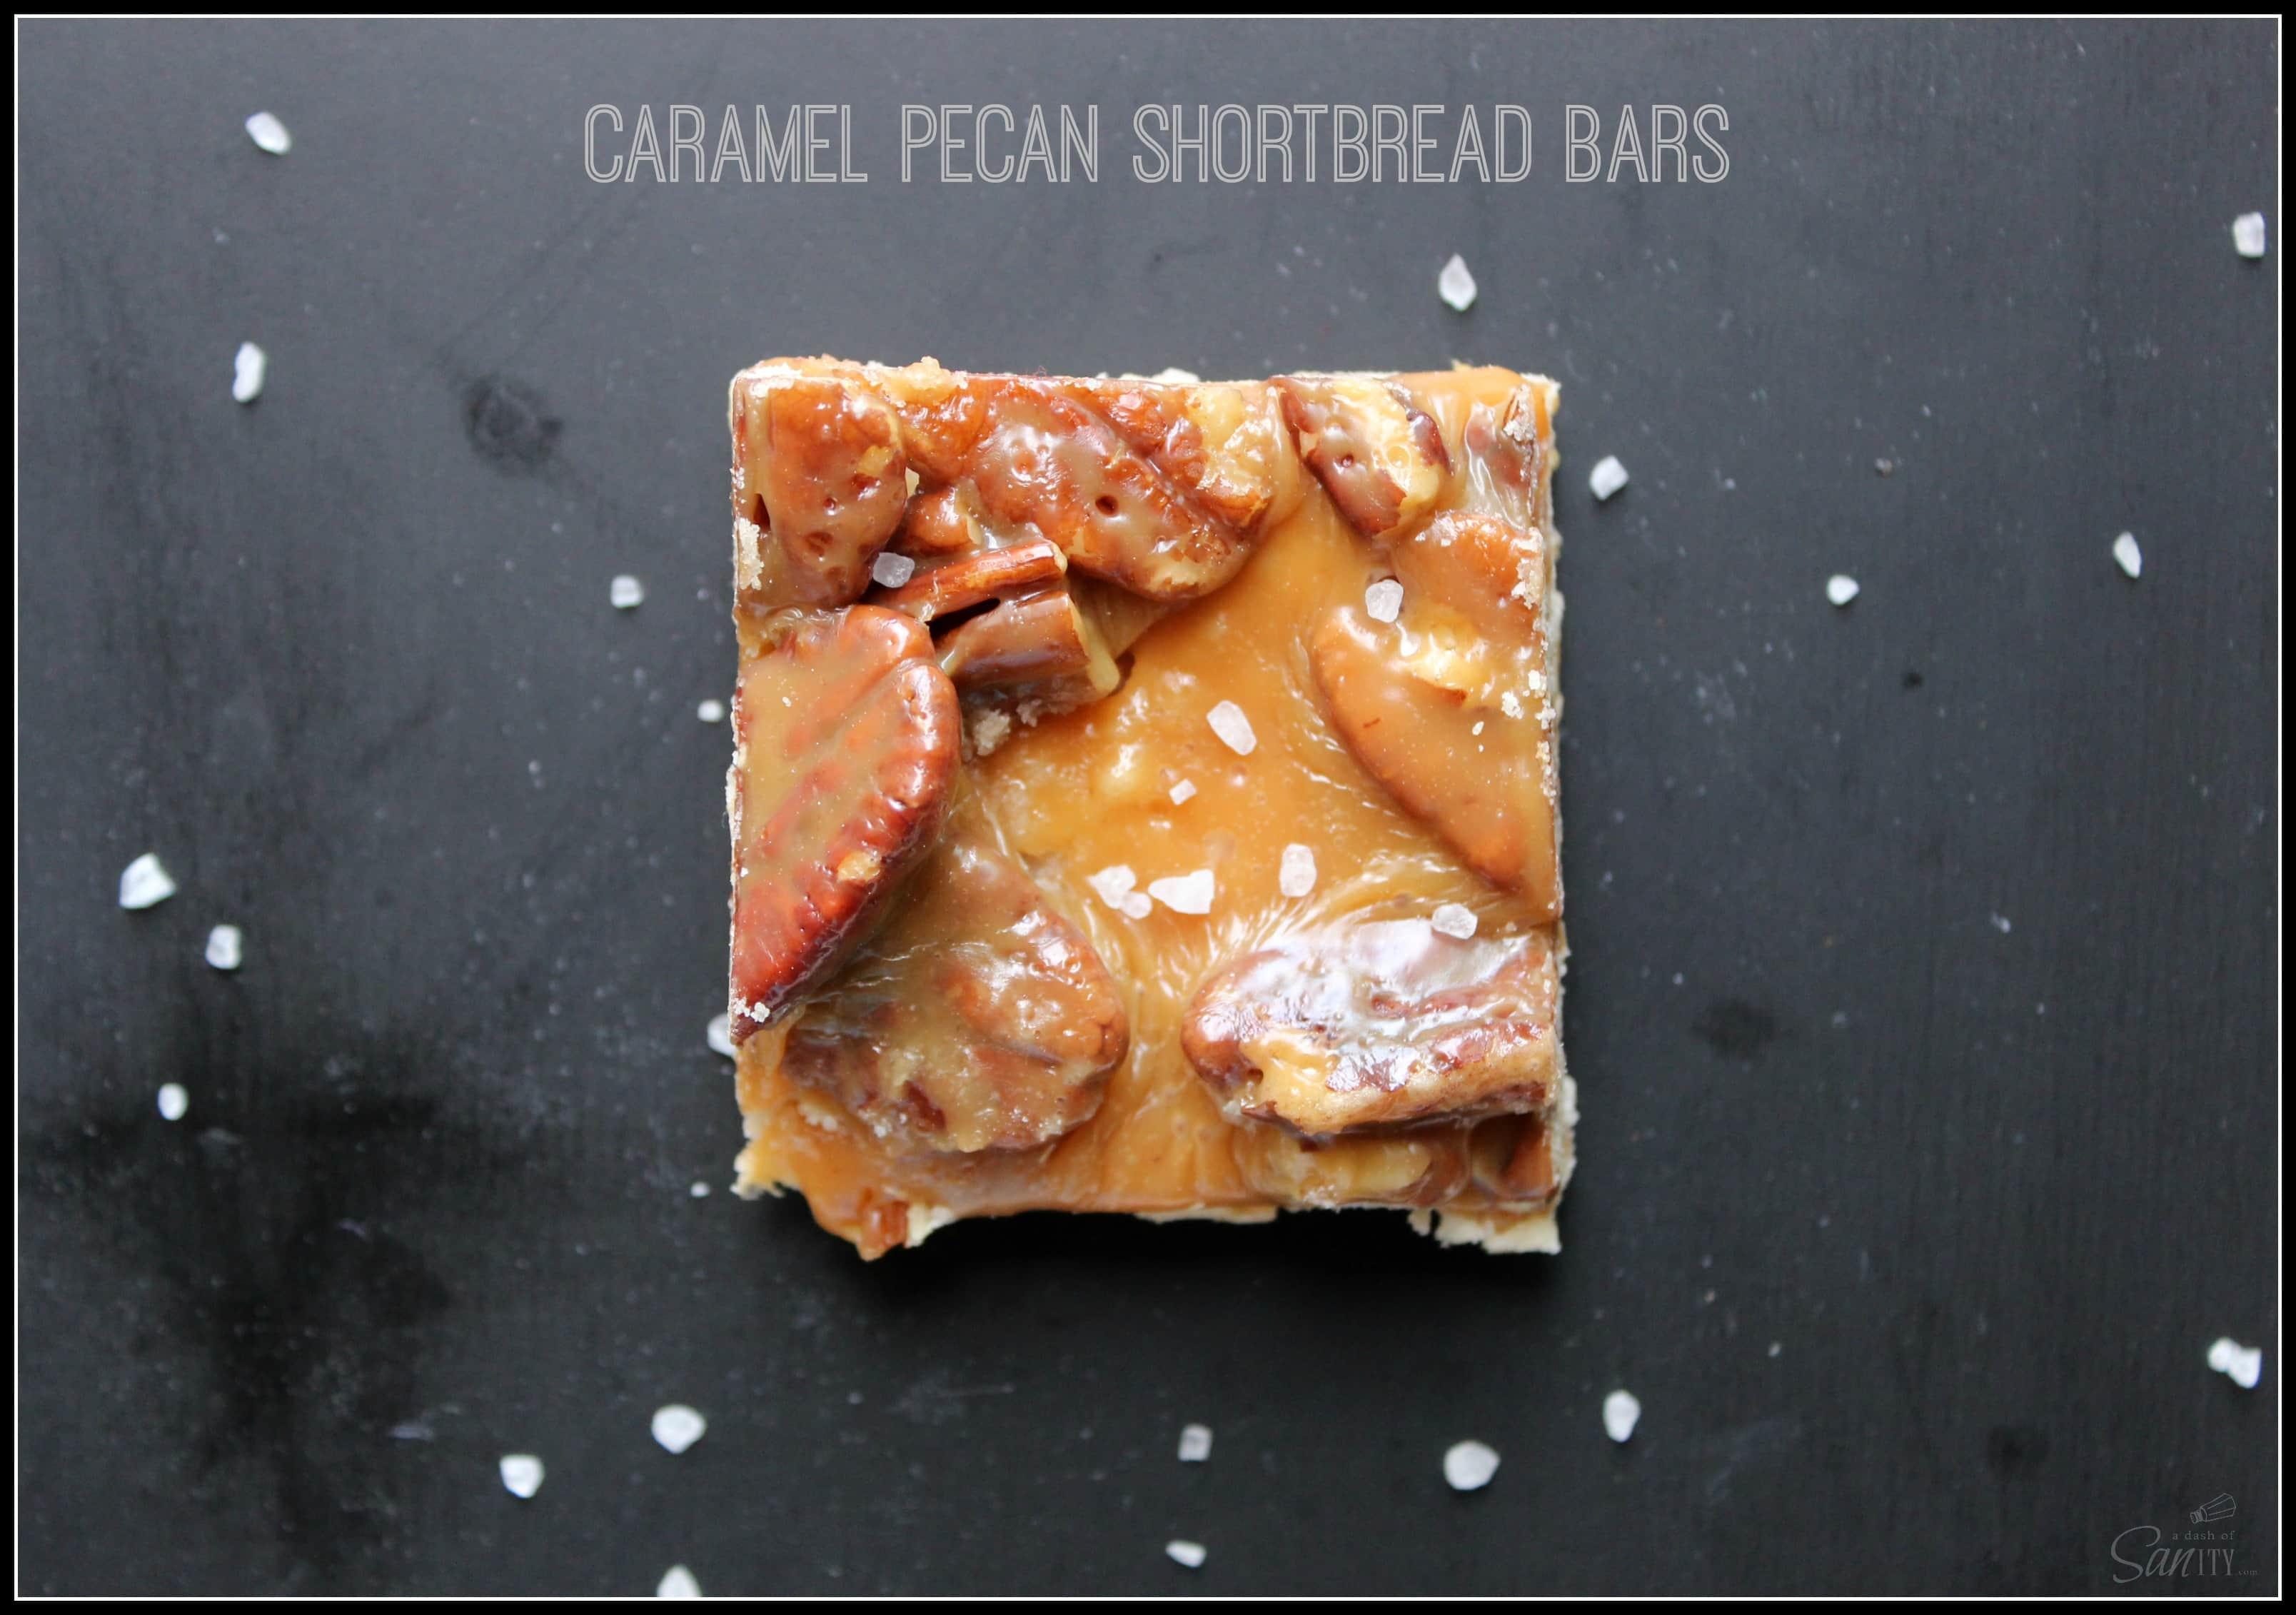 Caramel Pecan Shortbread Bars